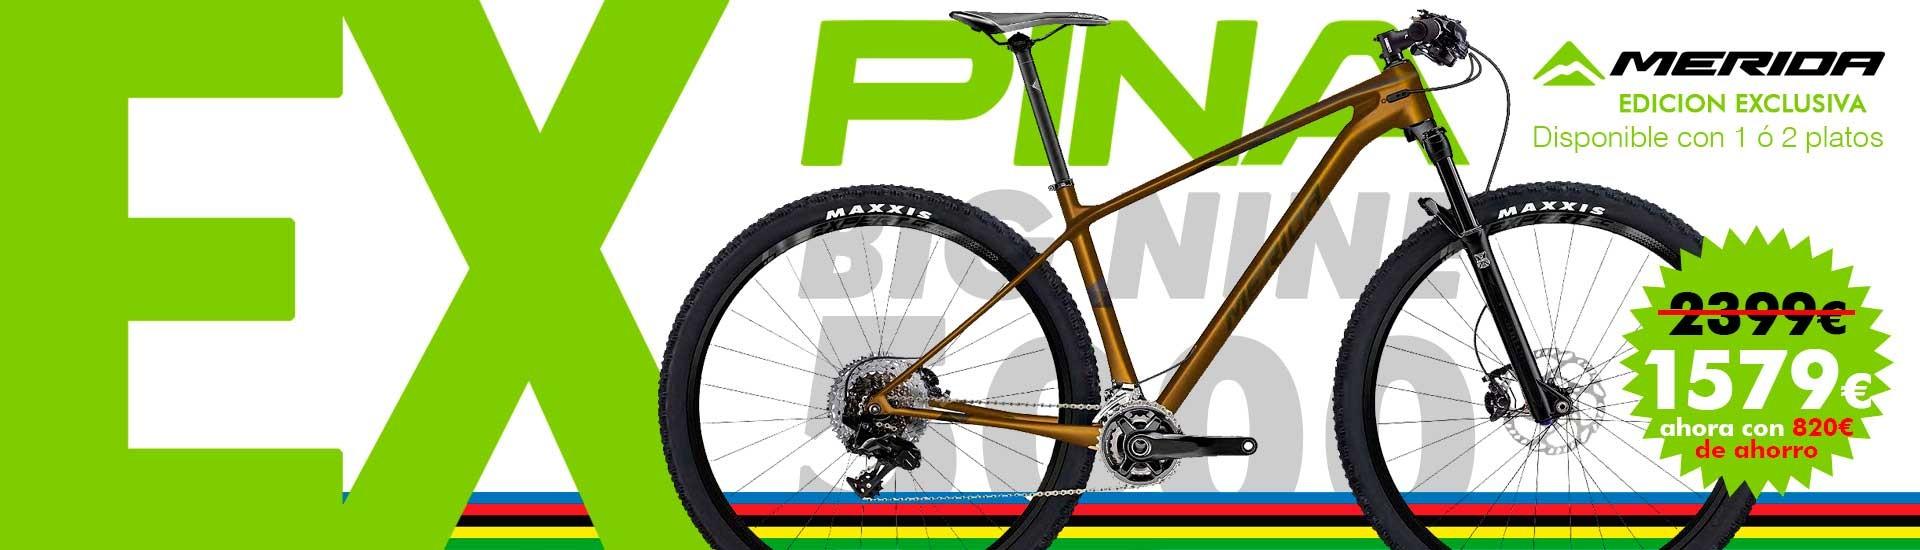 Bicicleta de montaña Merida Big Nine 5000 2019 Exclusiva Bicis Pina